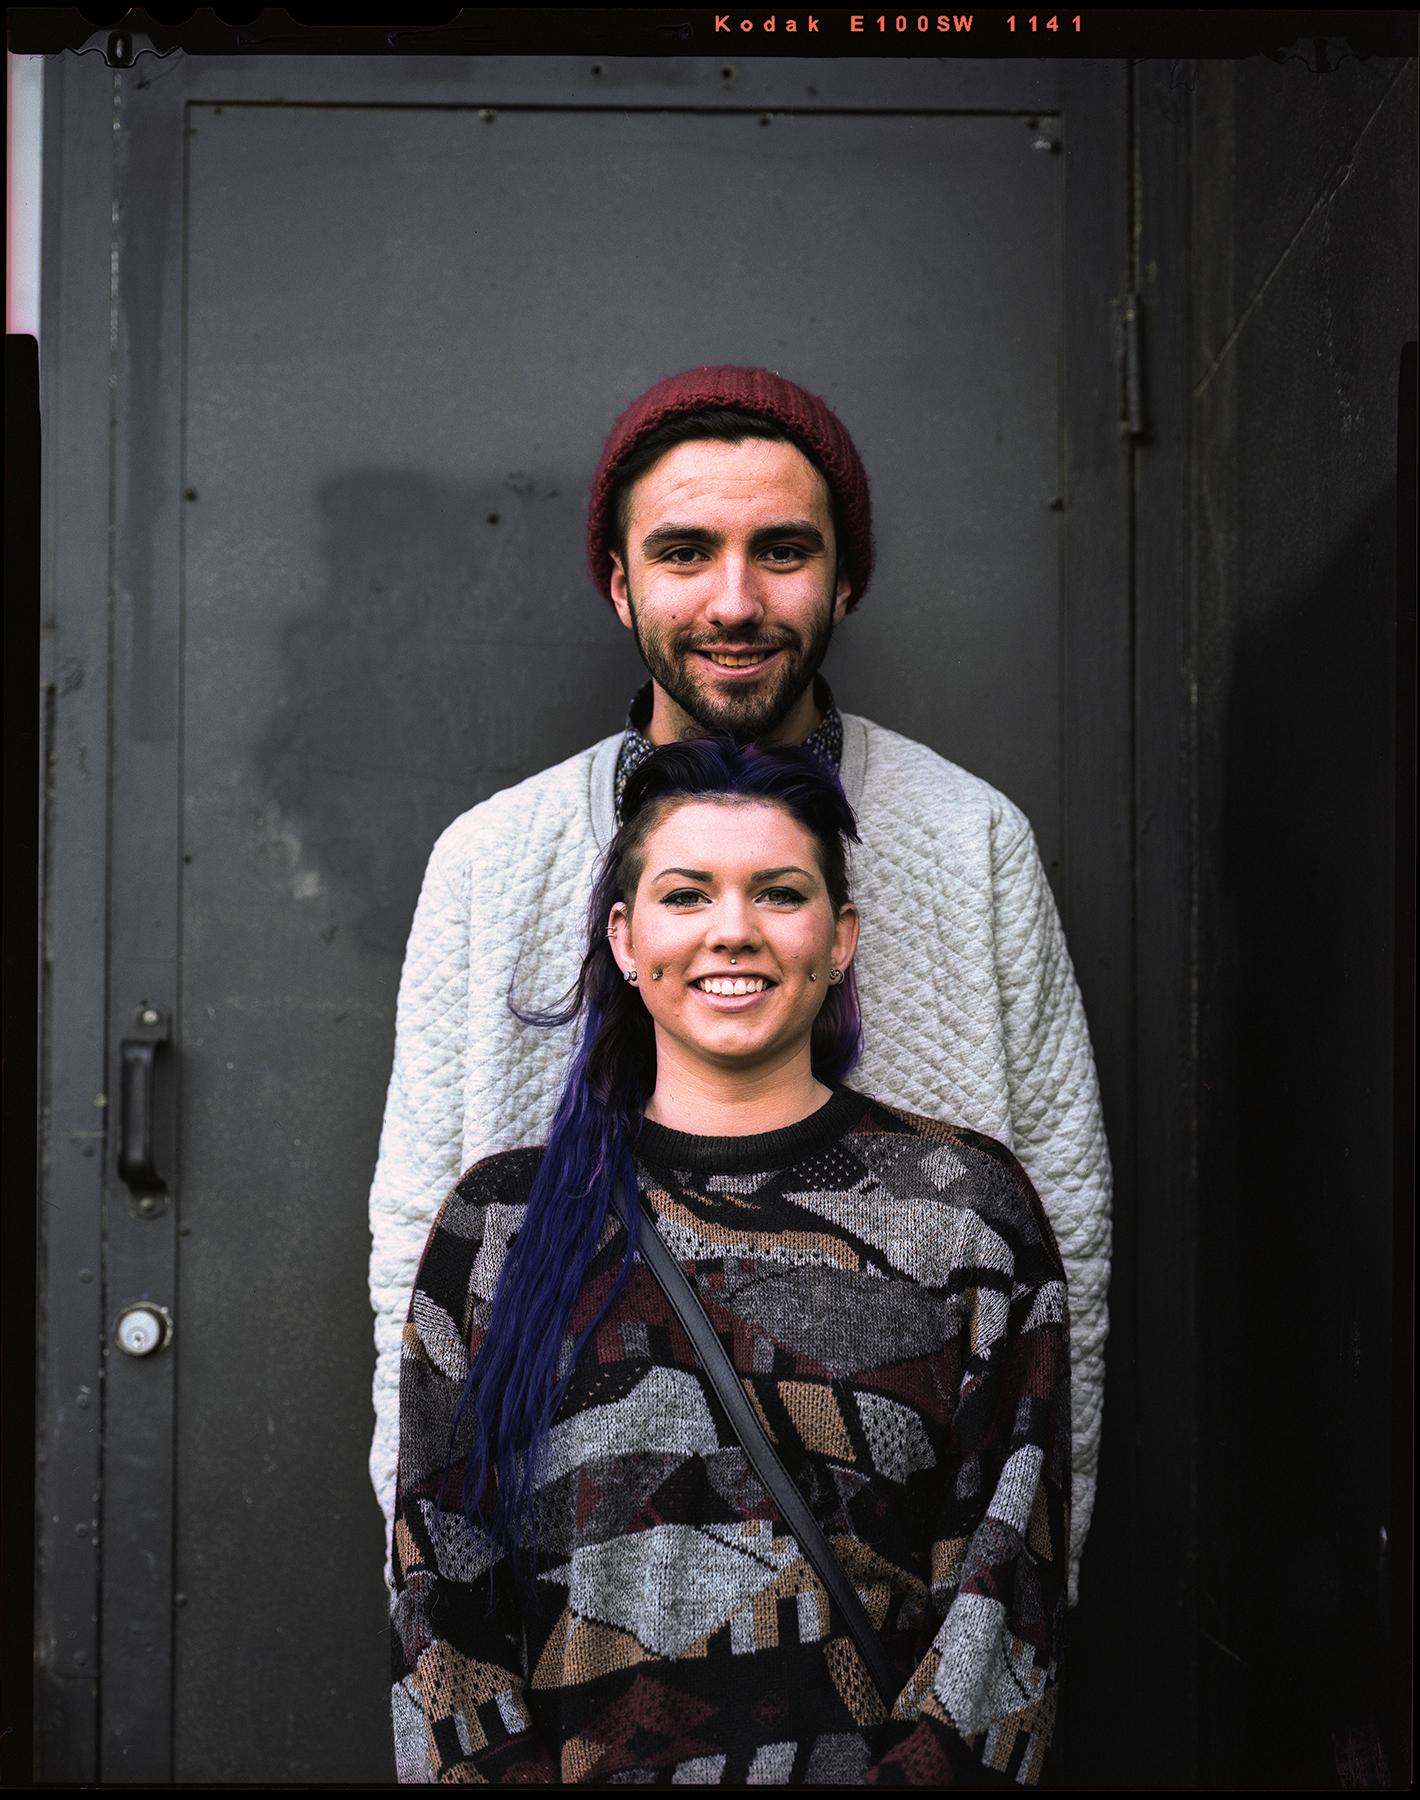 Jordan Urie | Stranger Portrait | Not A Couple | Toyo Omega View 45D Nikkor 150 f5.6